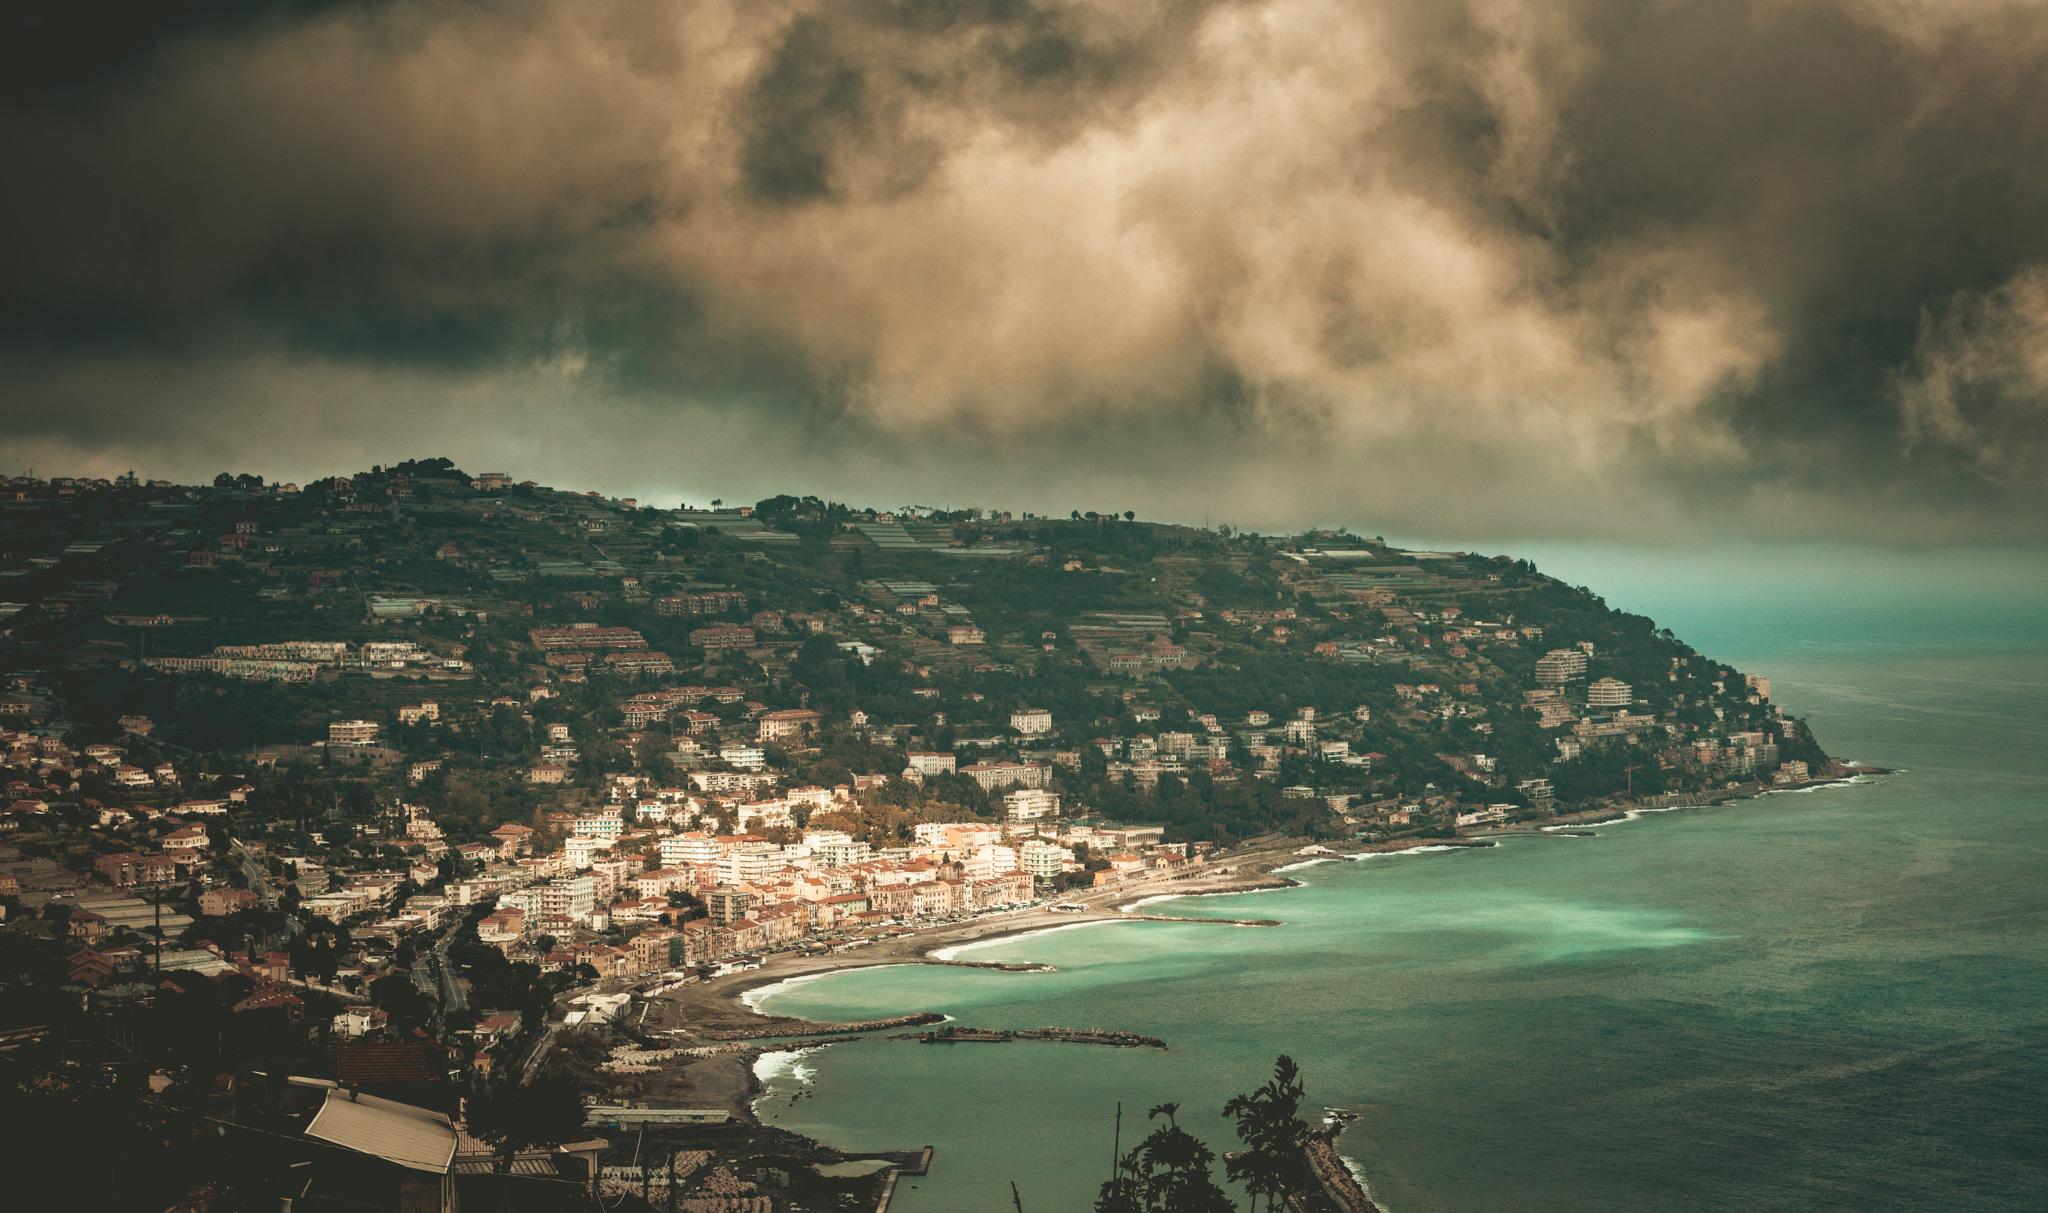 France : Provence : A view of the Ligurian coast across the Italian border